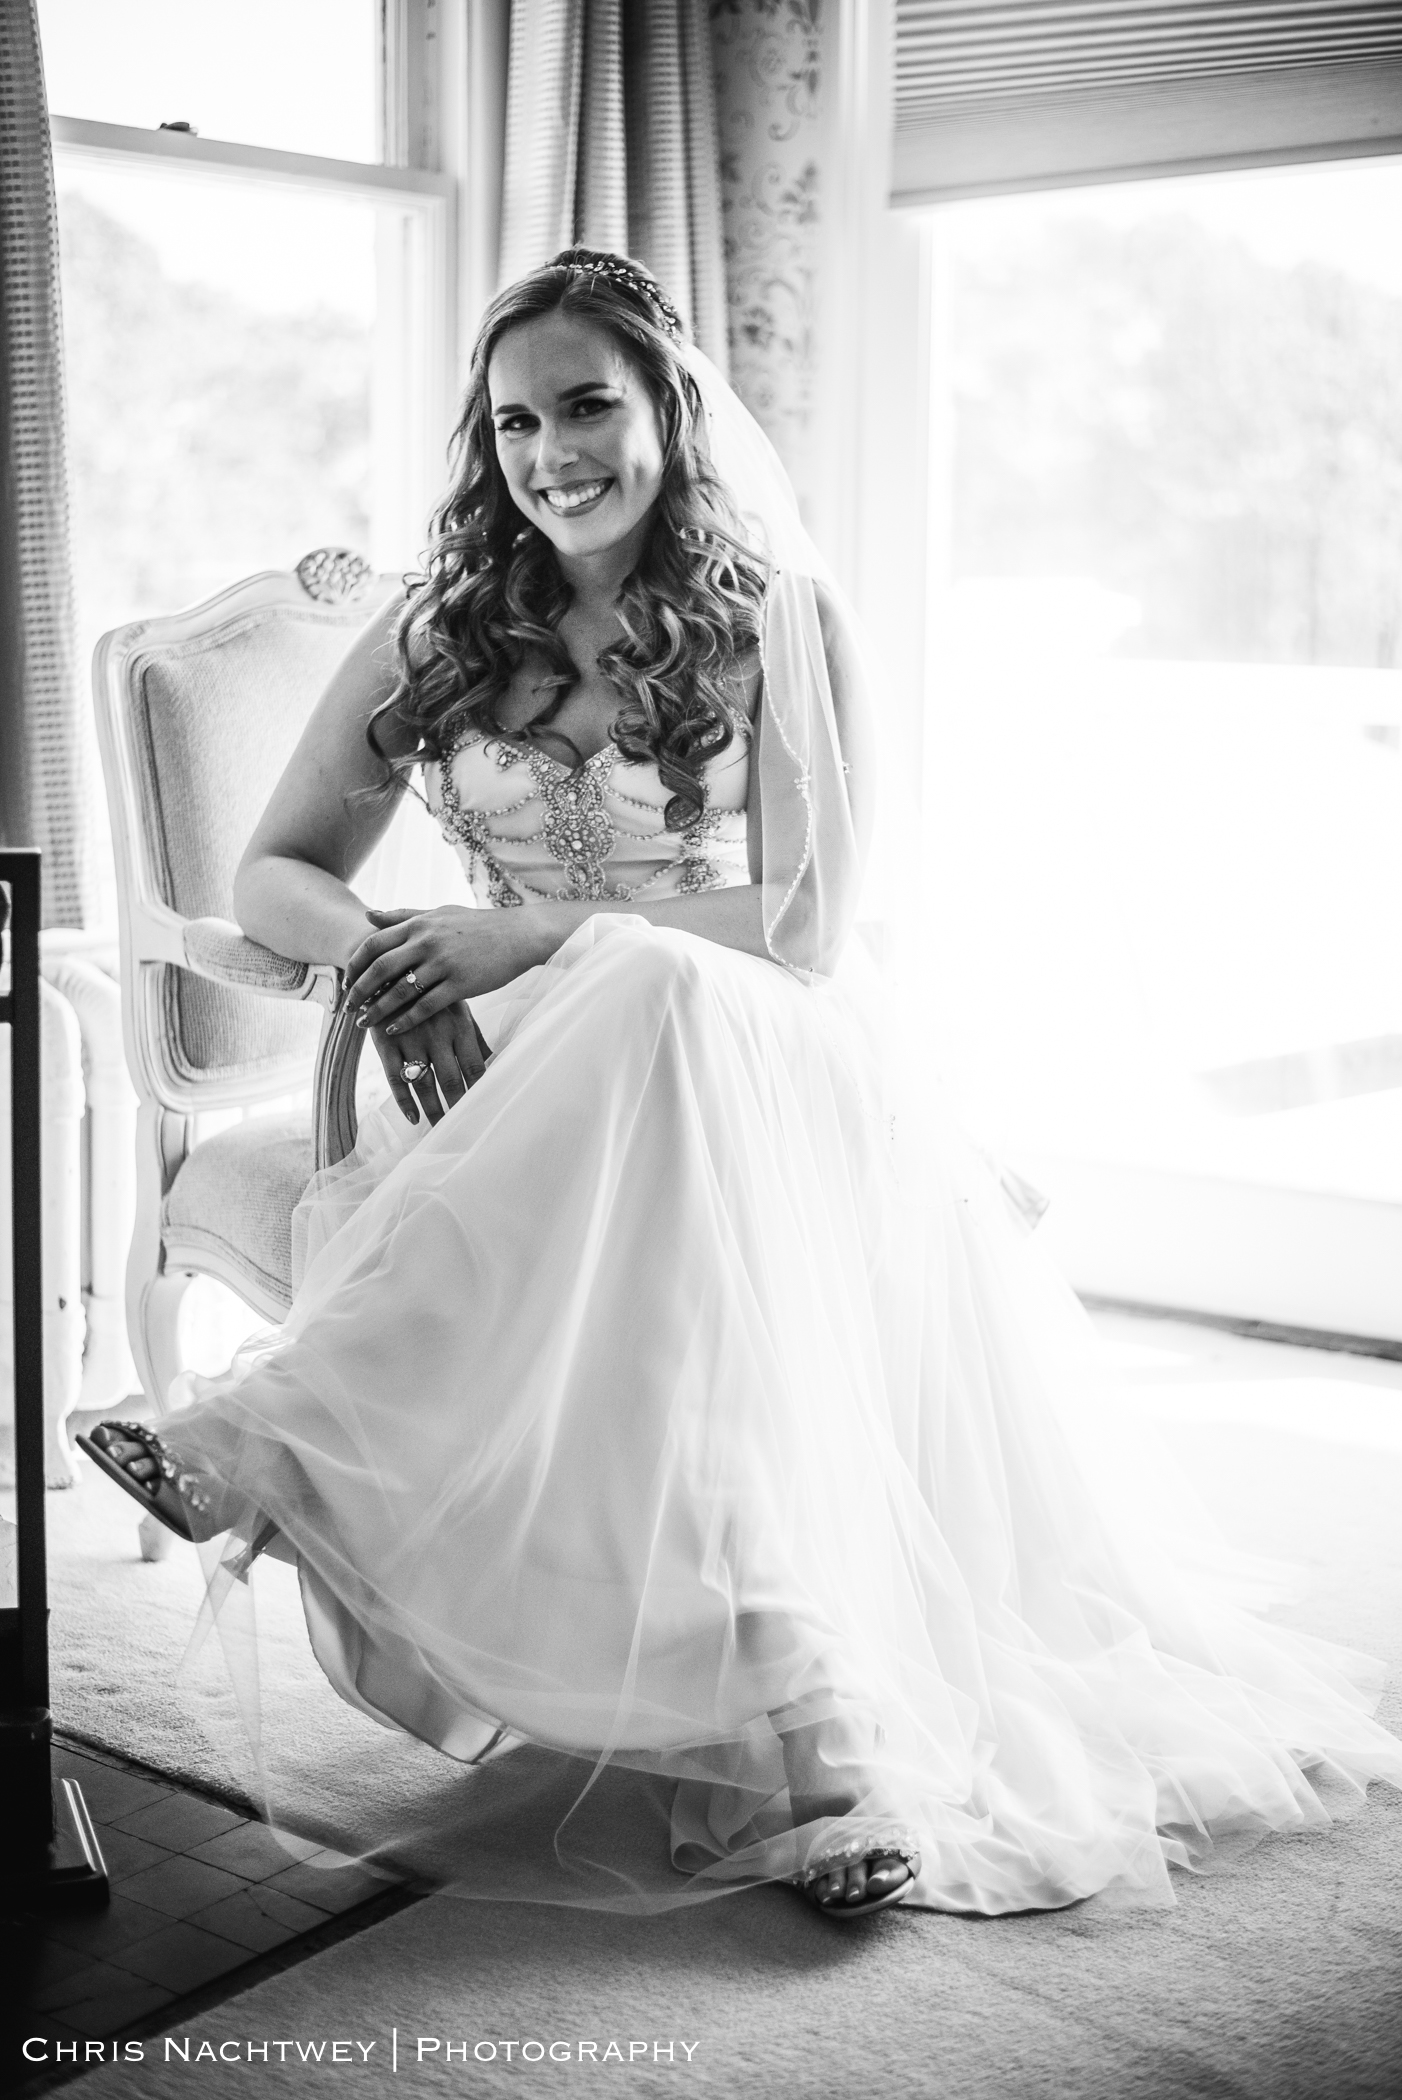 artistic-ct-wedding-photographers-chris-nachtwey-2017-37.jpg